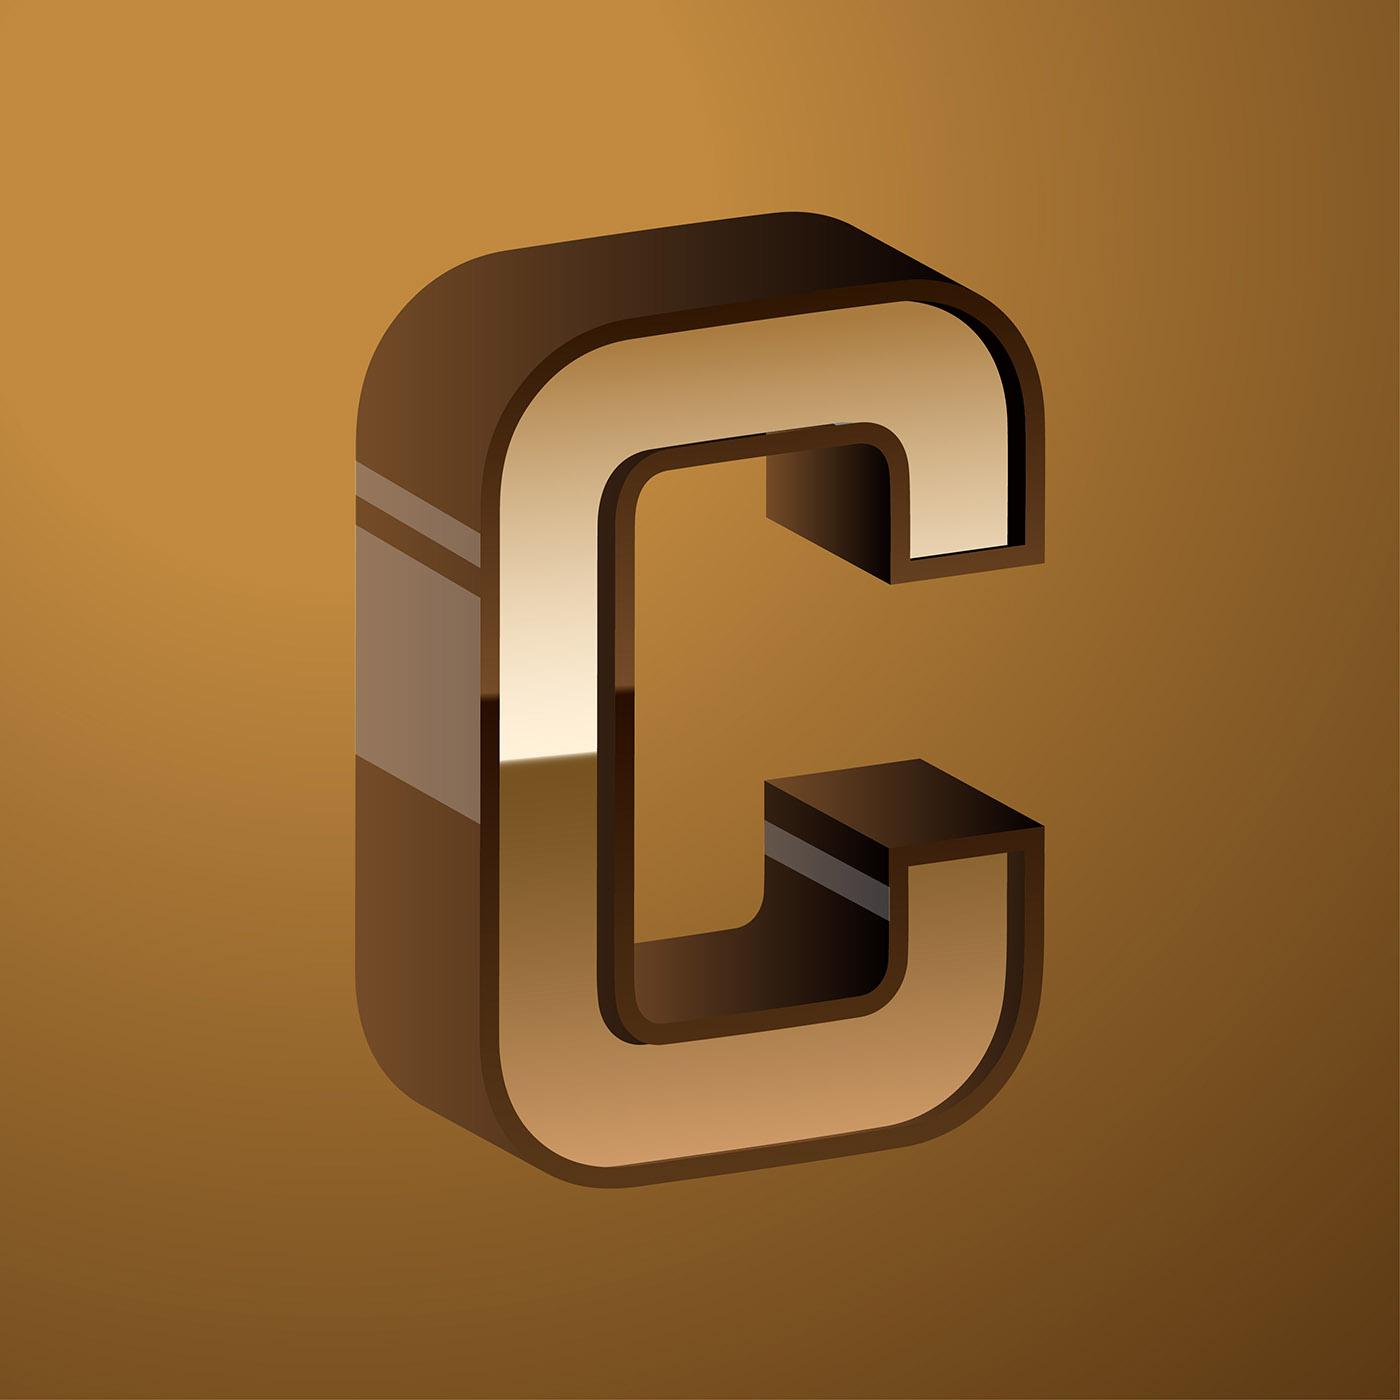 Letter C Typography 3d Vector